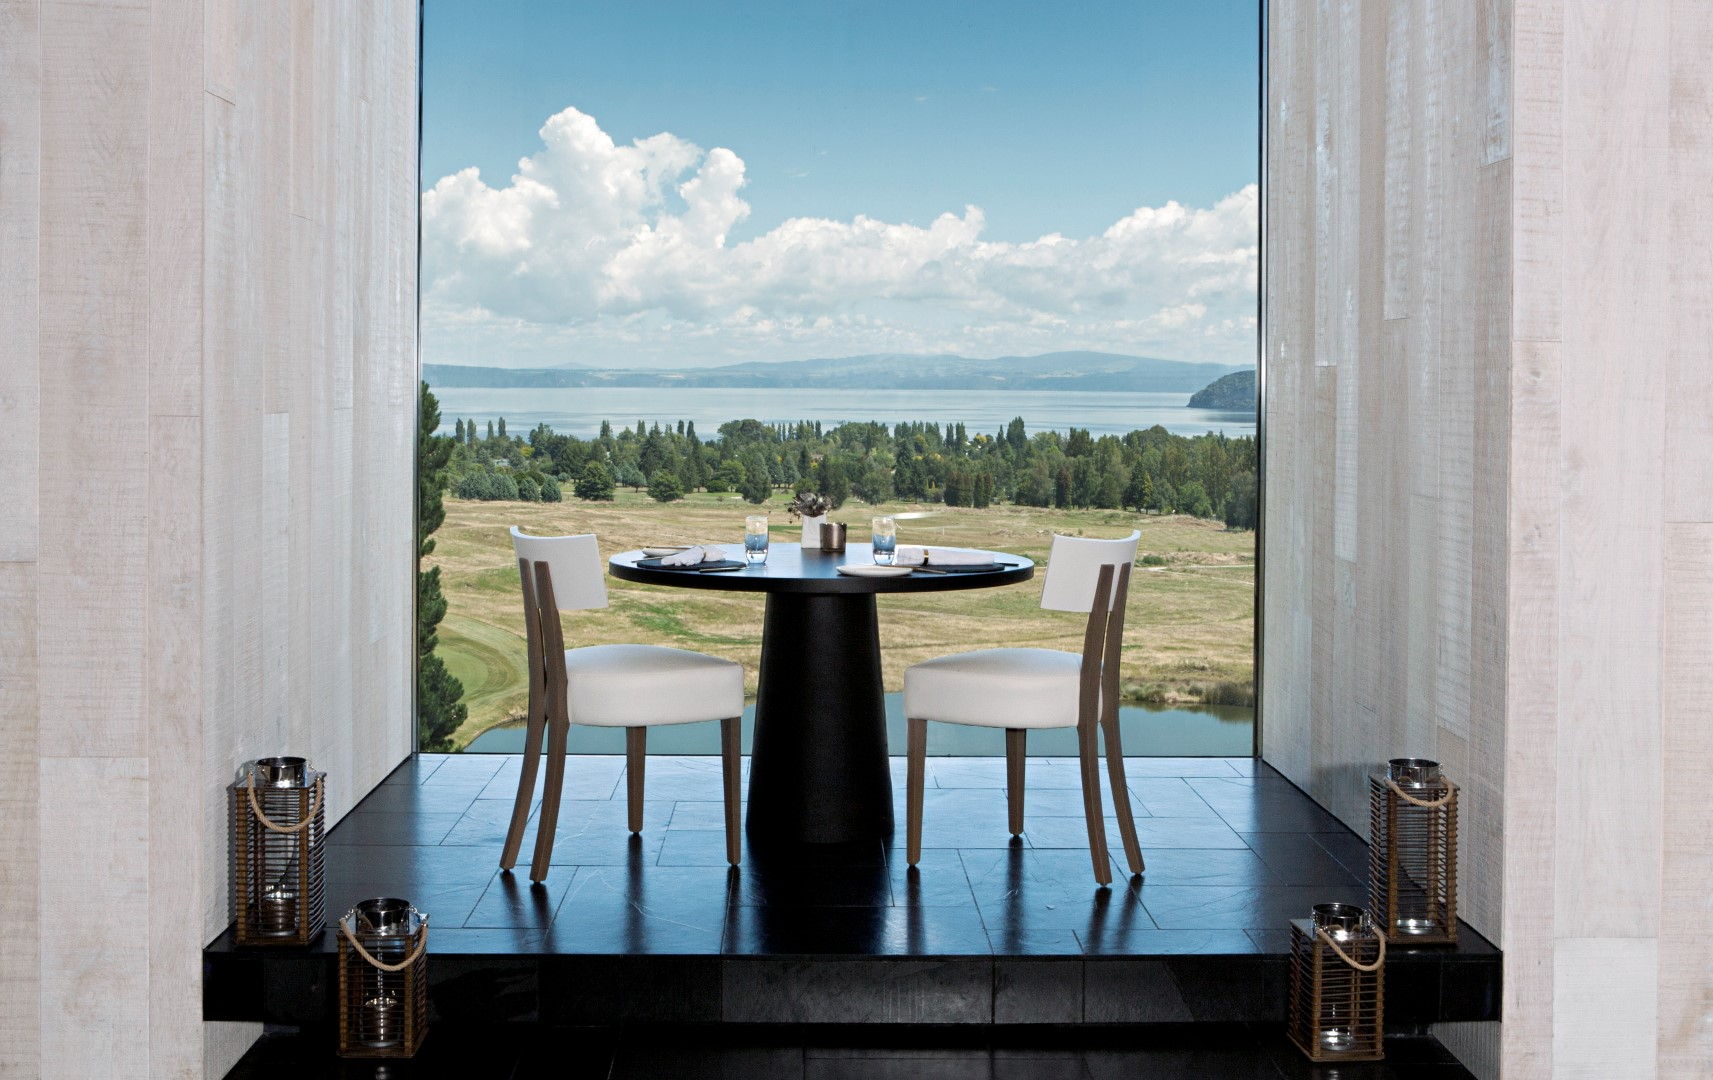 Fine dining Rotorua lunch or dinner